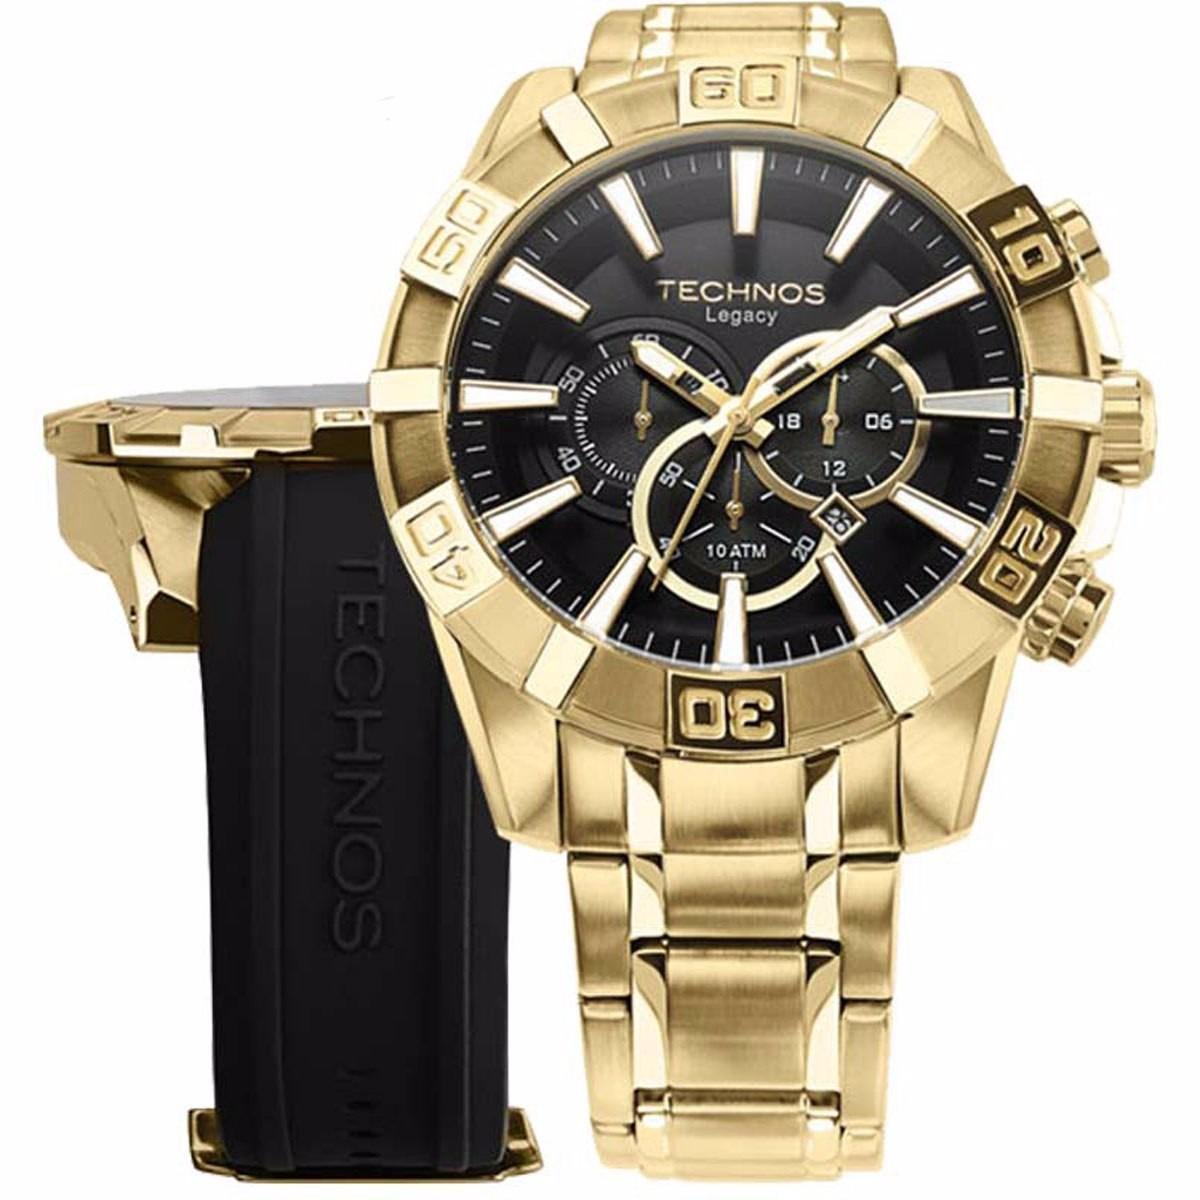 8d0ba755be9 Relógio Technos Masculino Classic Legacy Os2aajac 4p - R  949